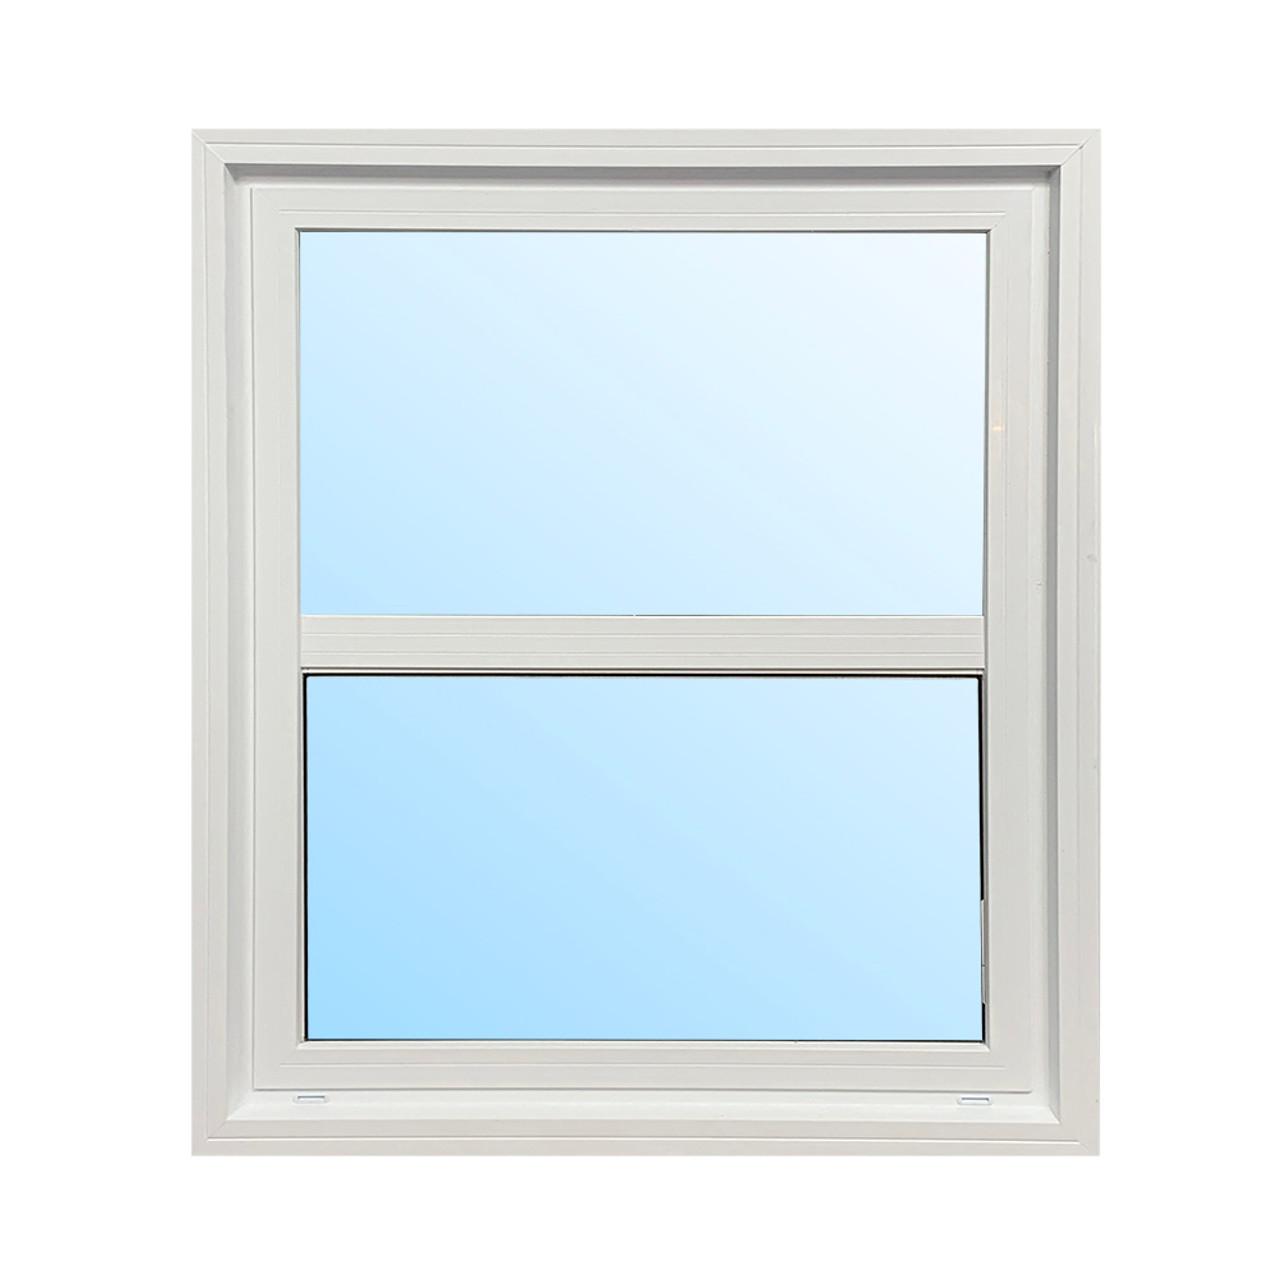 "Castlegard | 30"" x 36"" Single Hung Window | LEA"